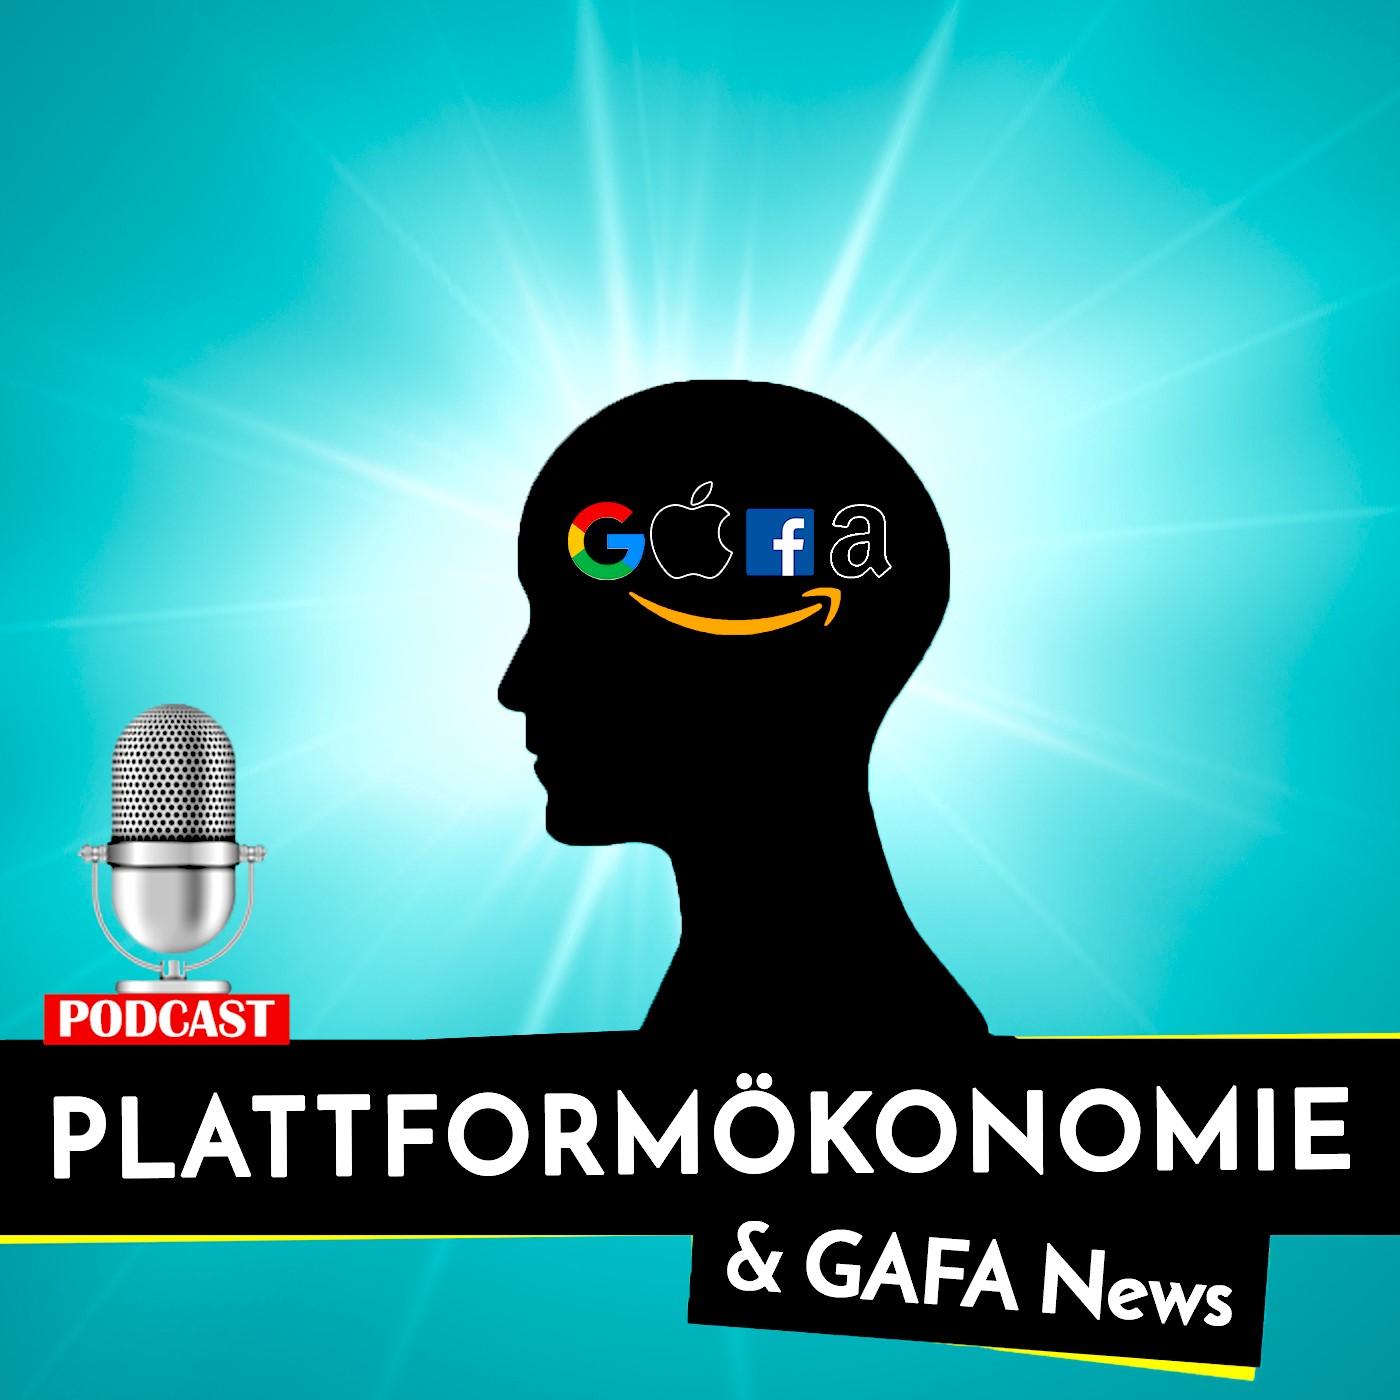 News heute: Neurolink, Robinhood, Amazon, Spotivy, Wirecard, Home24, Adjust